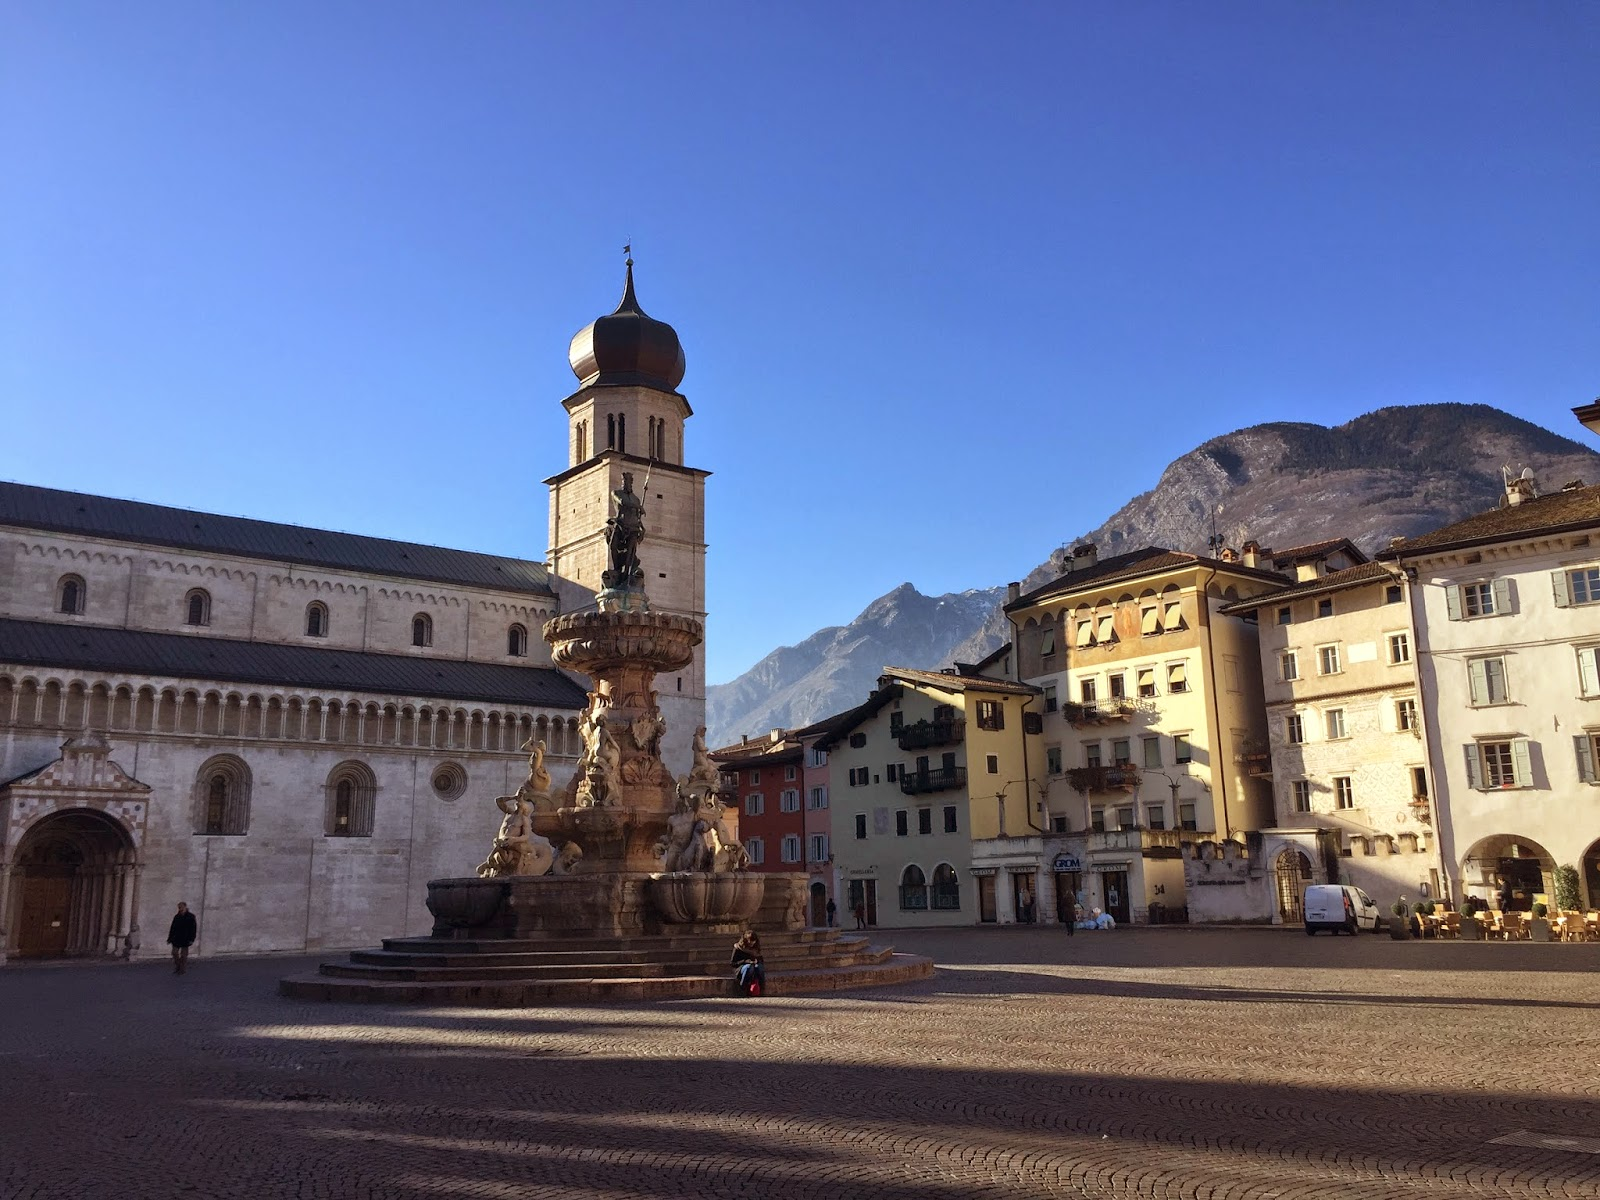 Trento in Trentino Italy